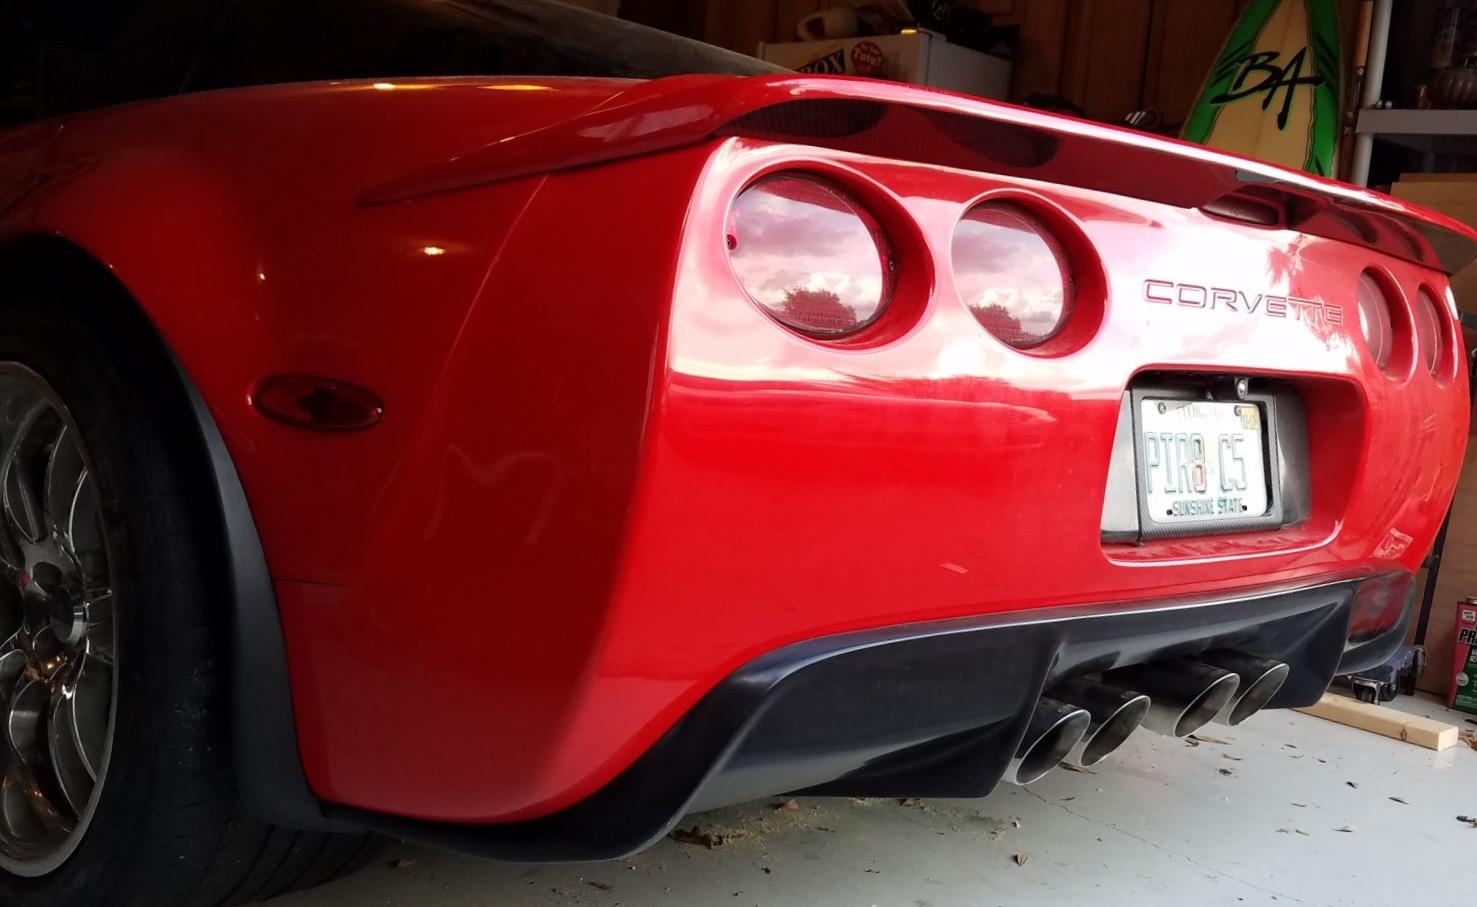 2005 Corvette For Sale >> Stealth C5 Rear Diffuser - Urethane - Corvette Creationz